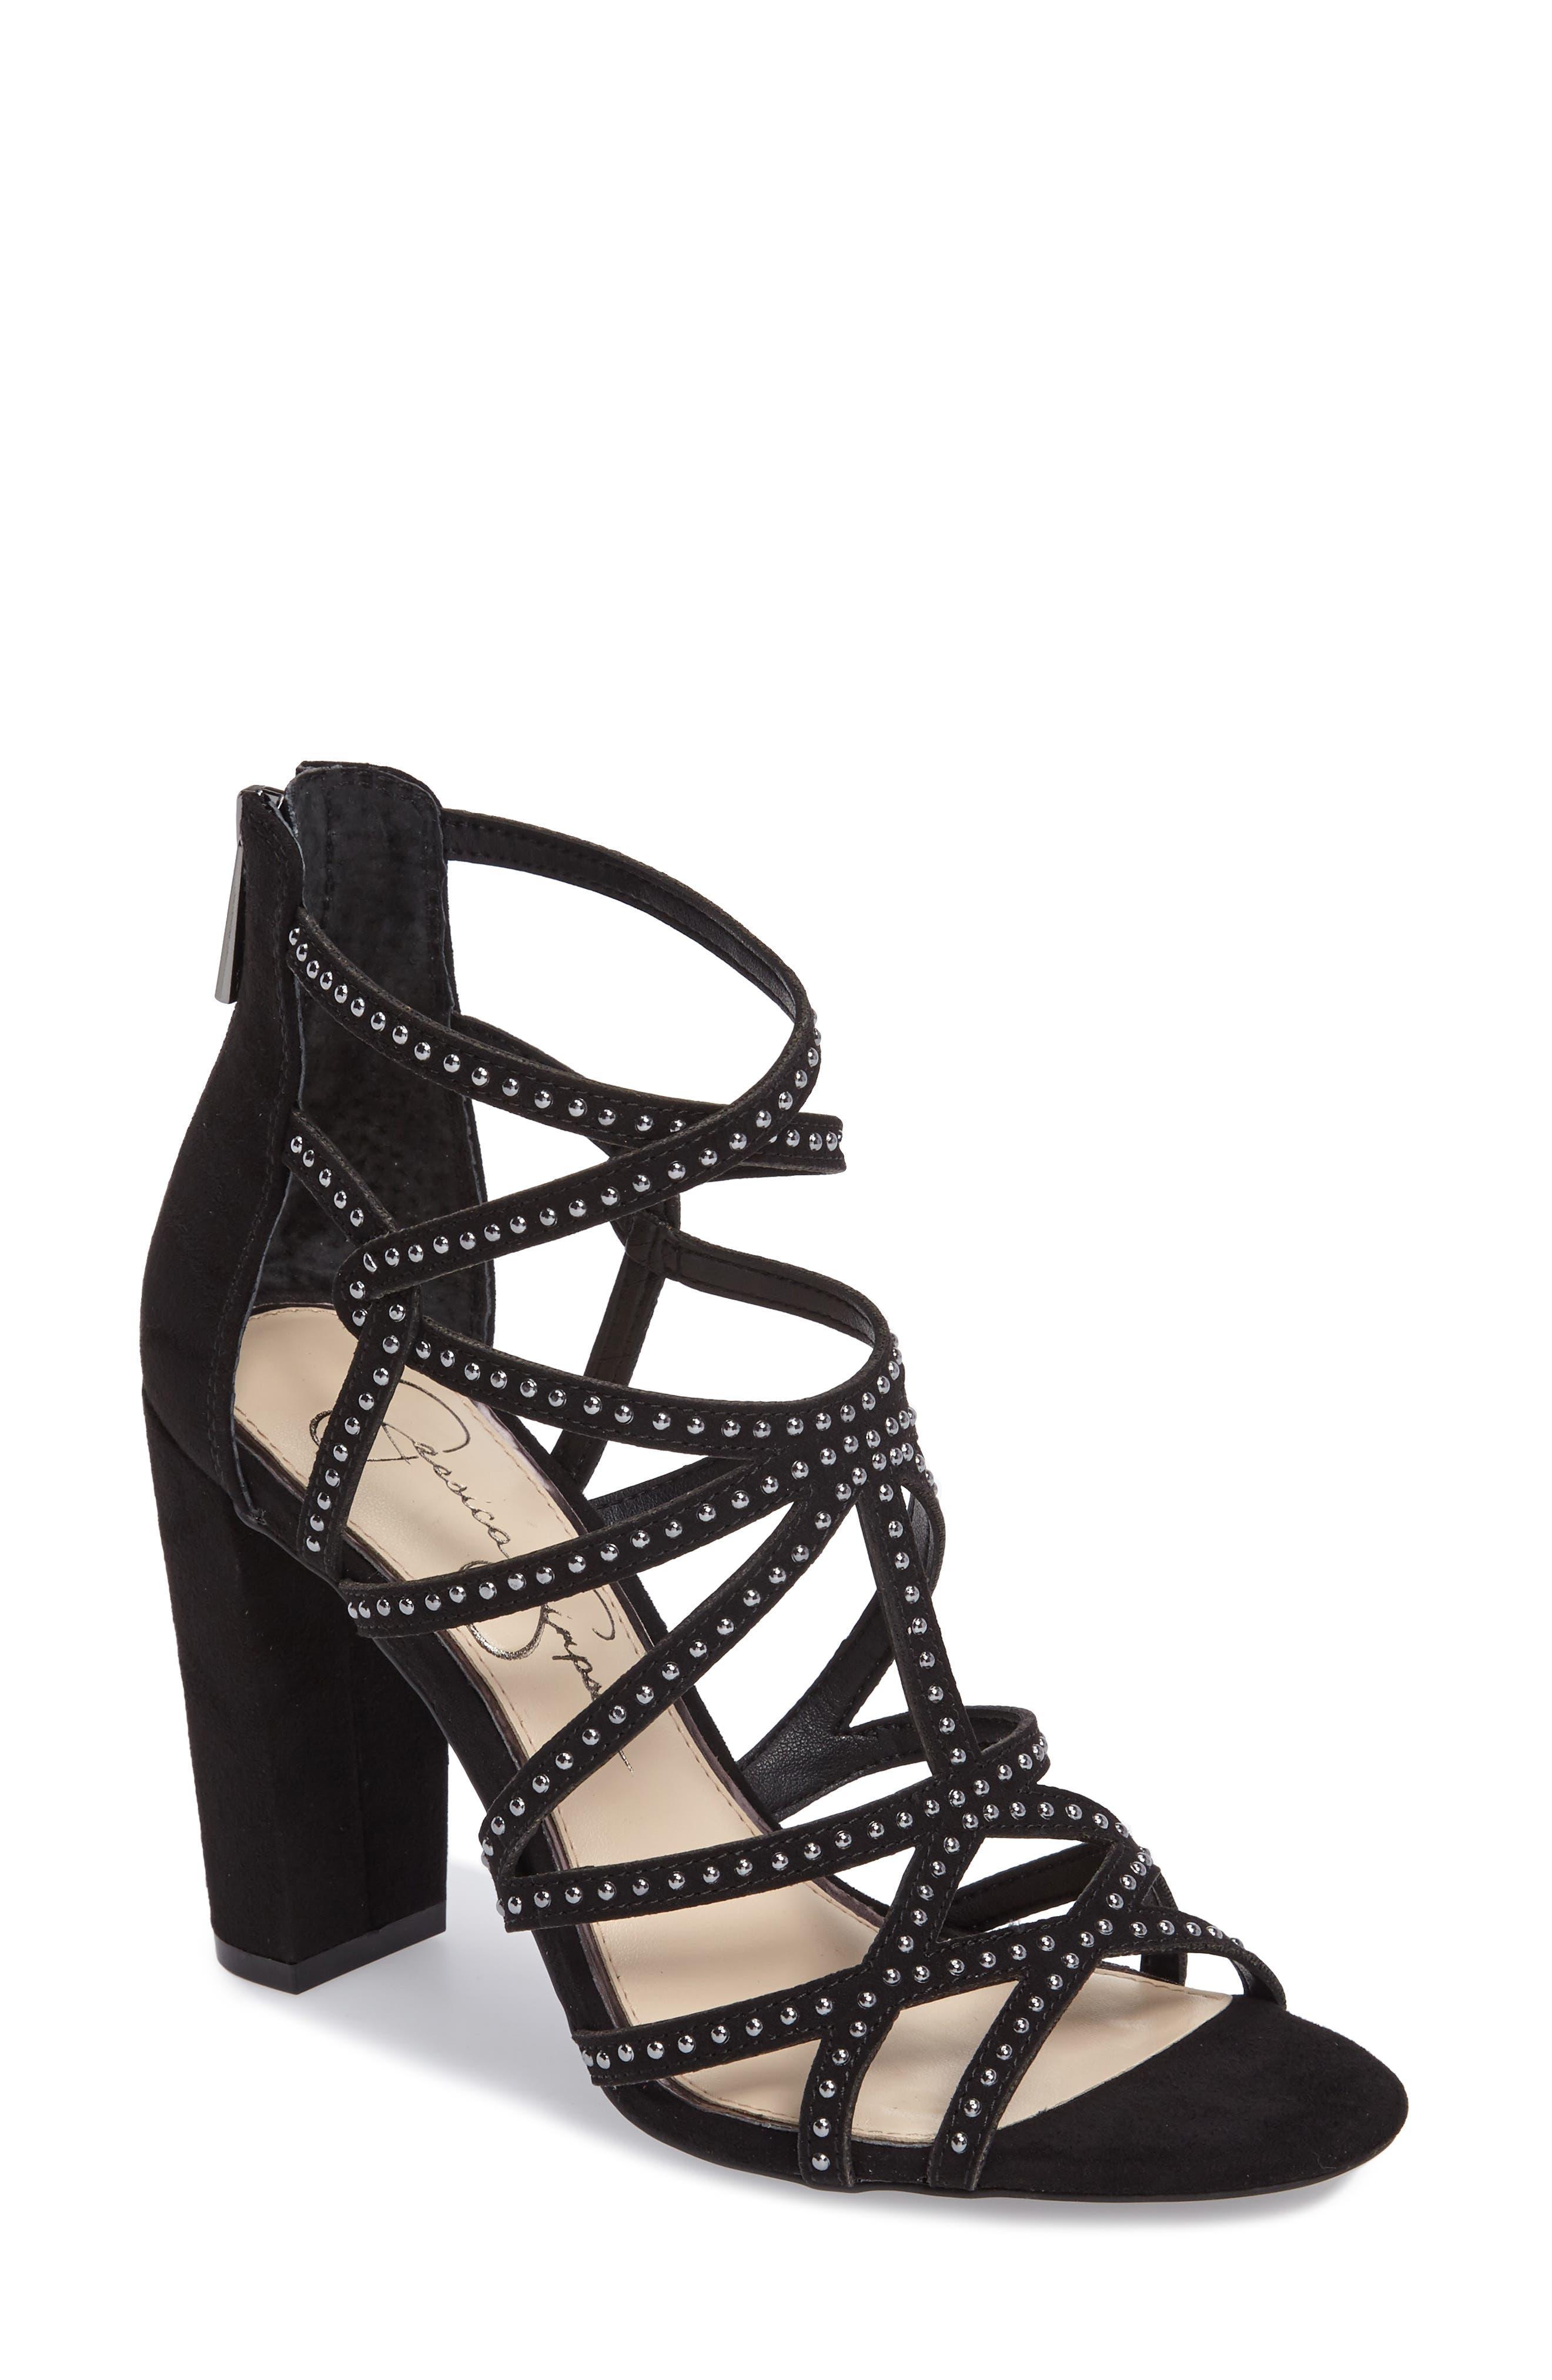 Emmi Block Heel Sandal,                         Main,                         color,